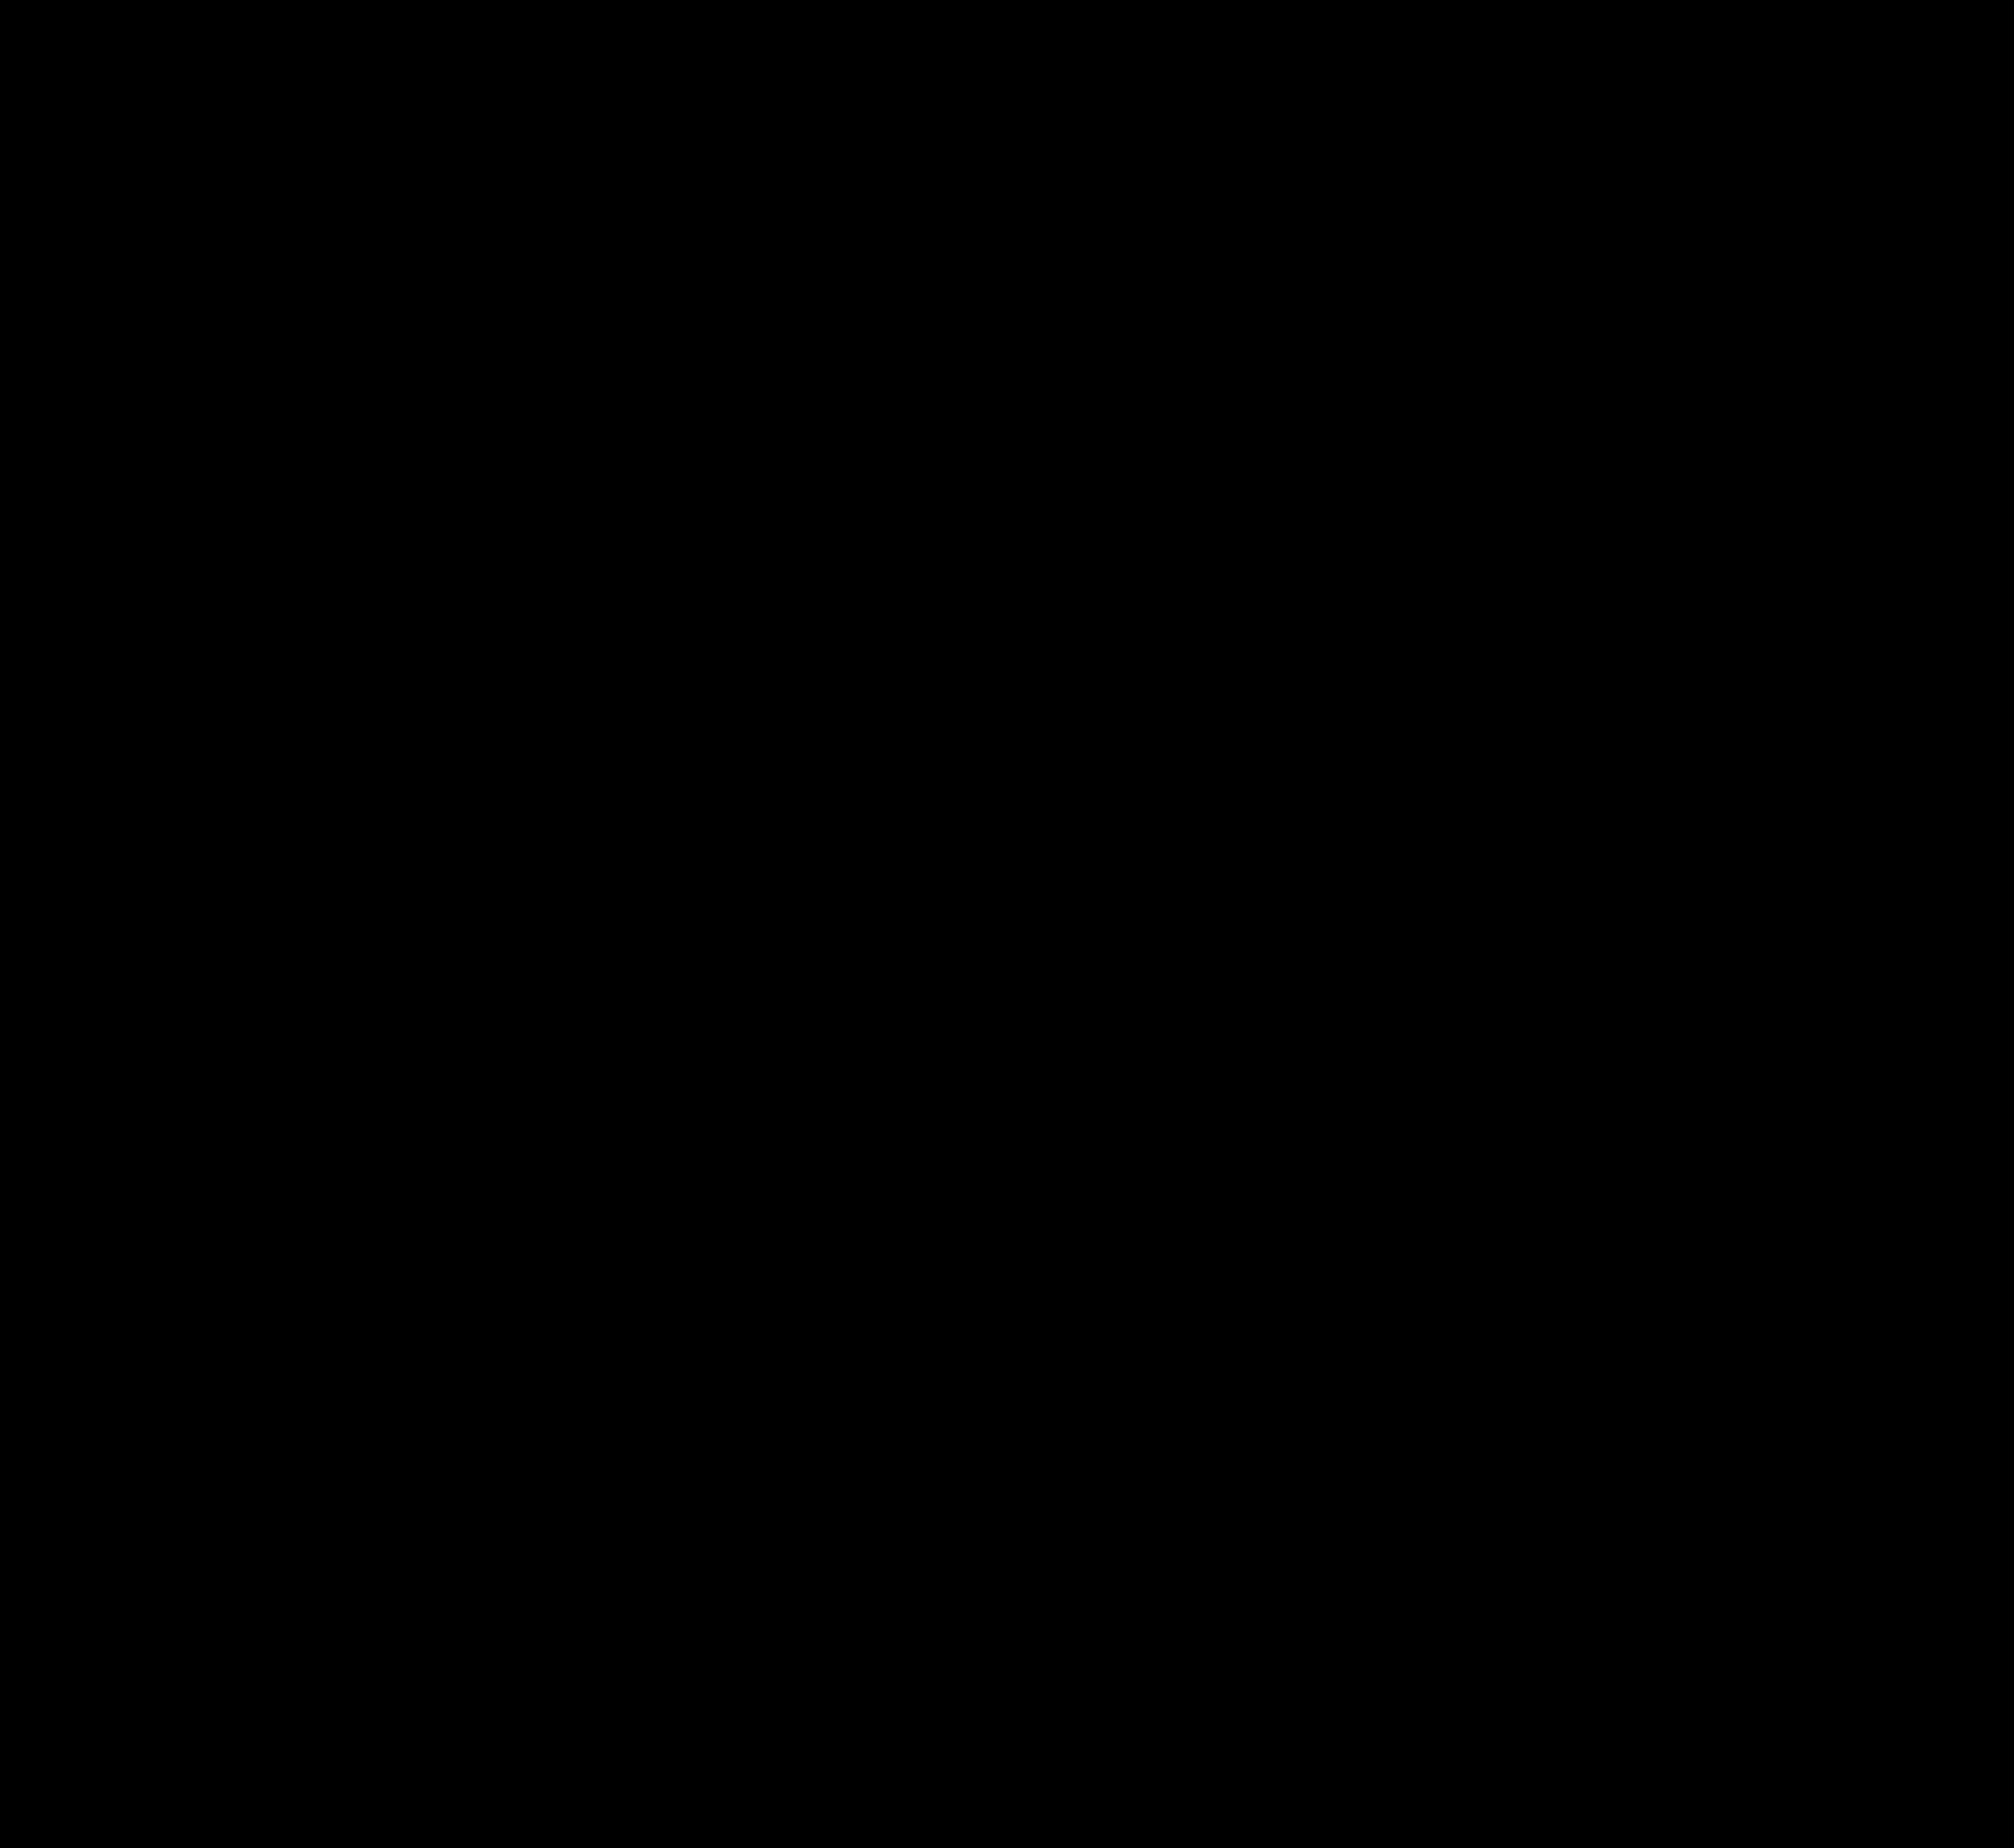 2400x2202 Clipart